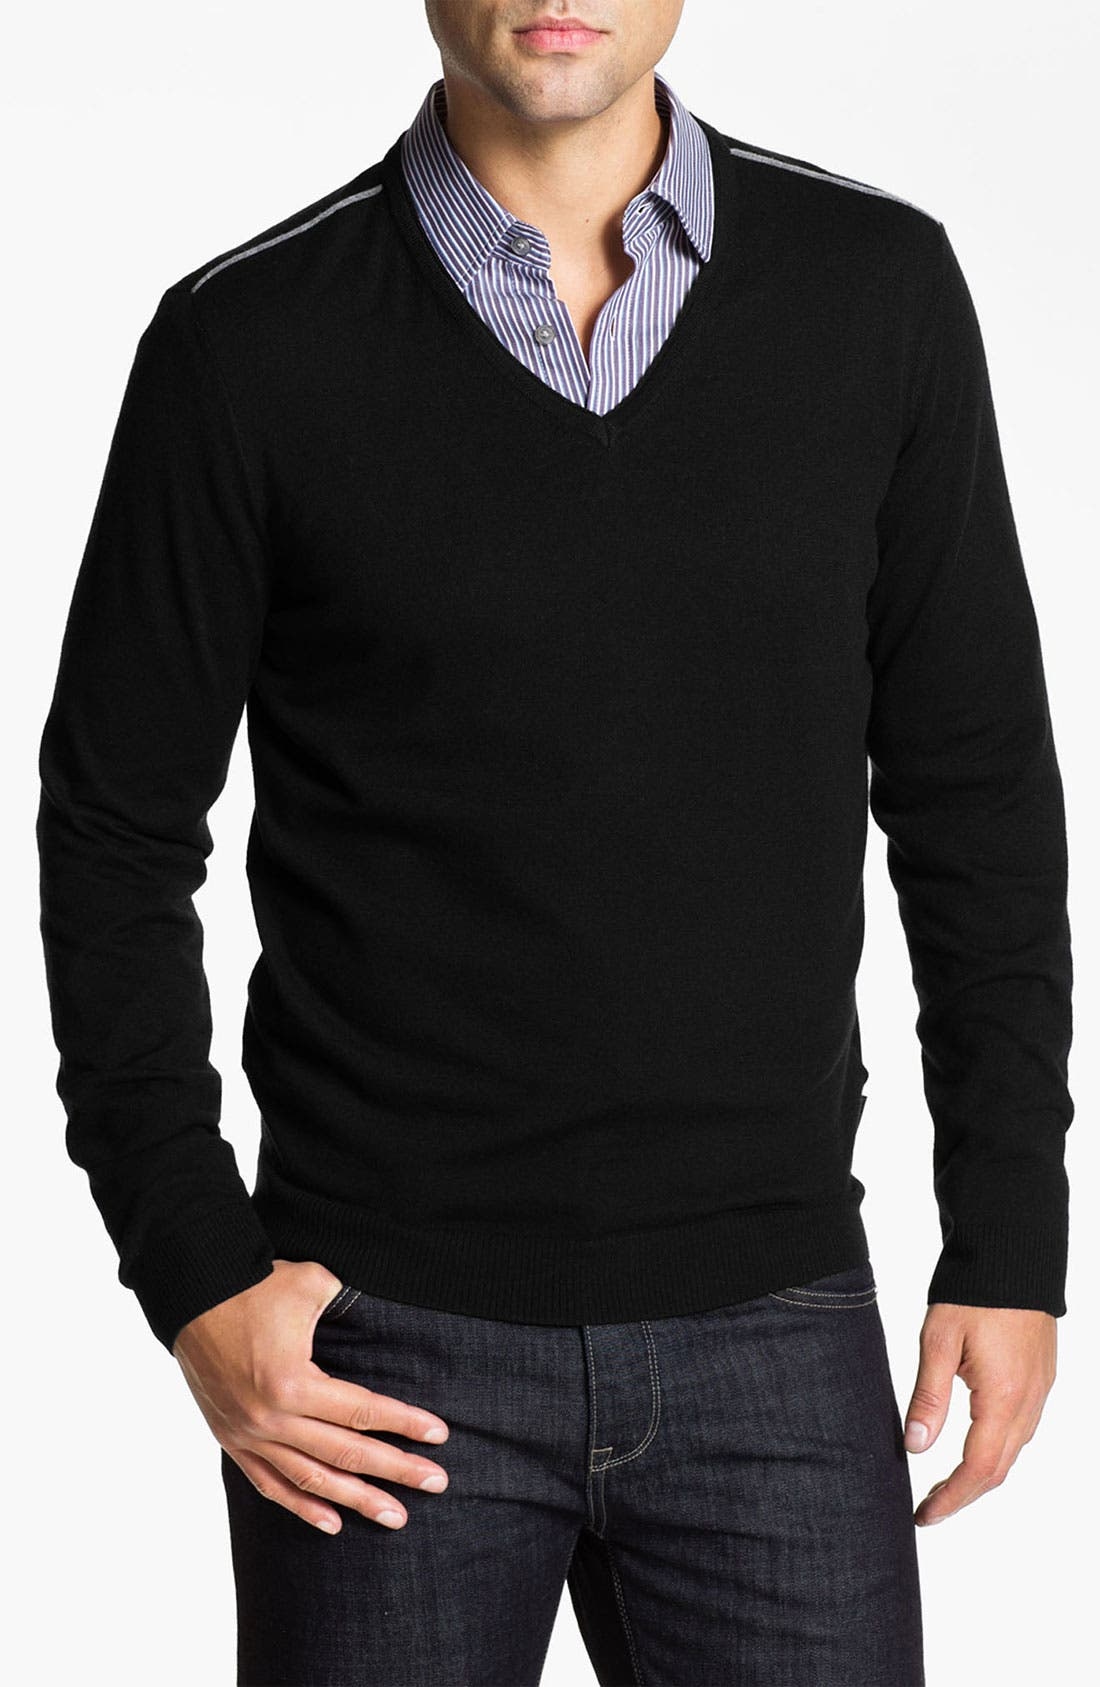 Alternate Image 1 Selected - BOSS Black 'Lukas' V-Neck Wool Blend Sweater